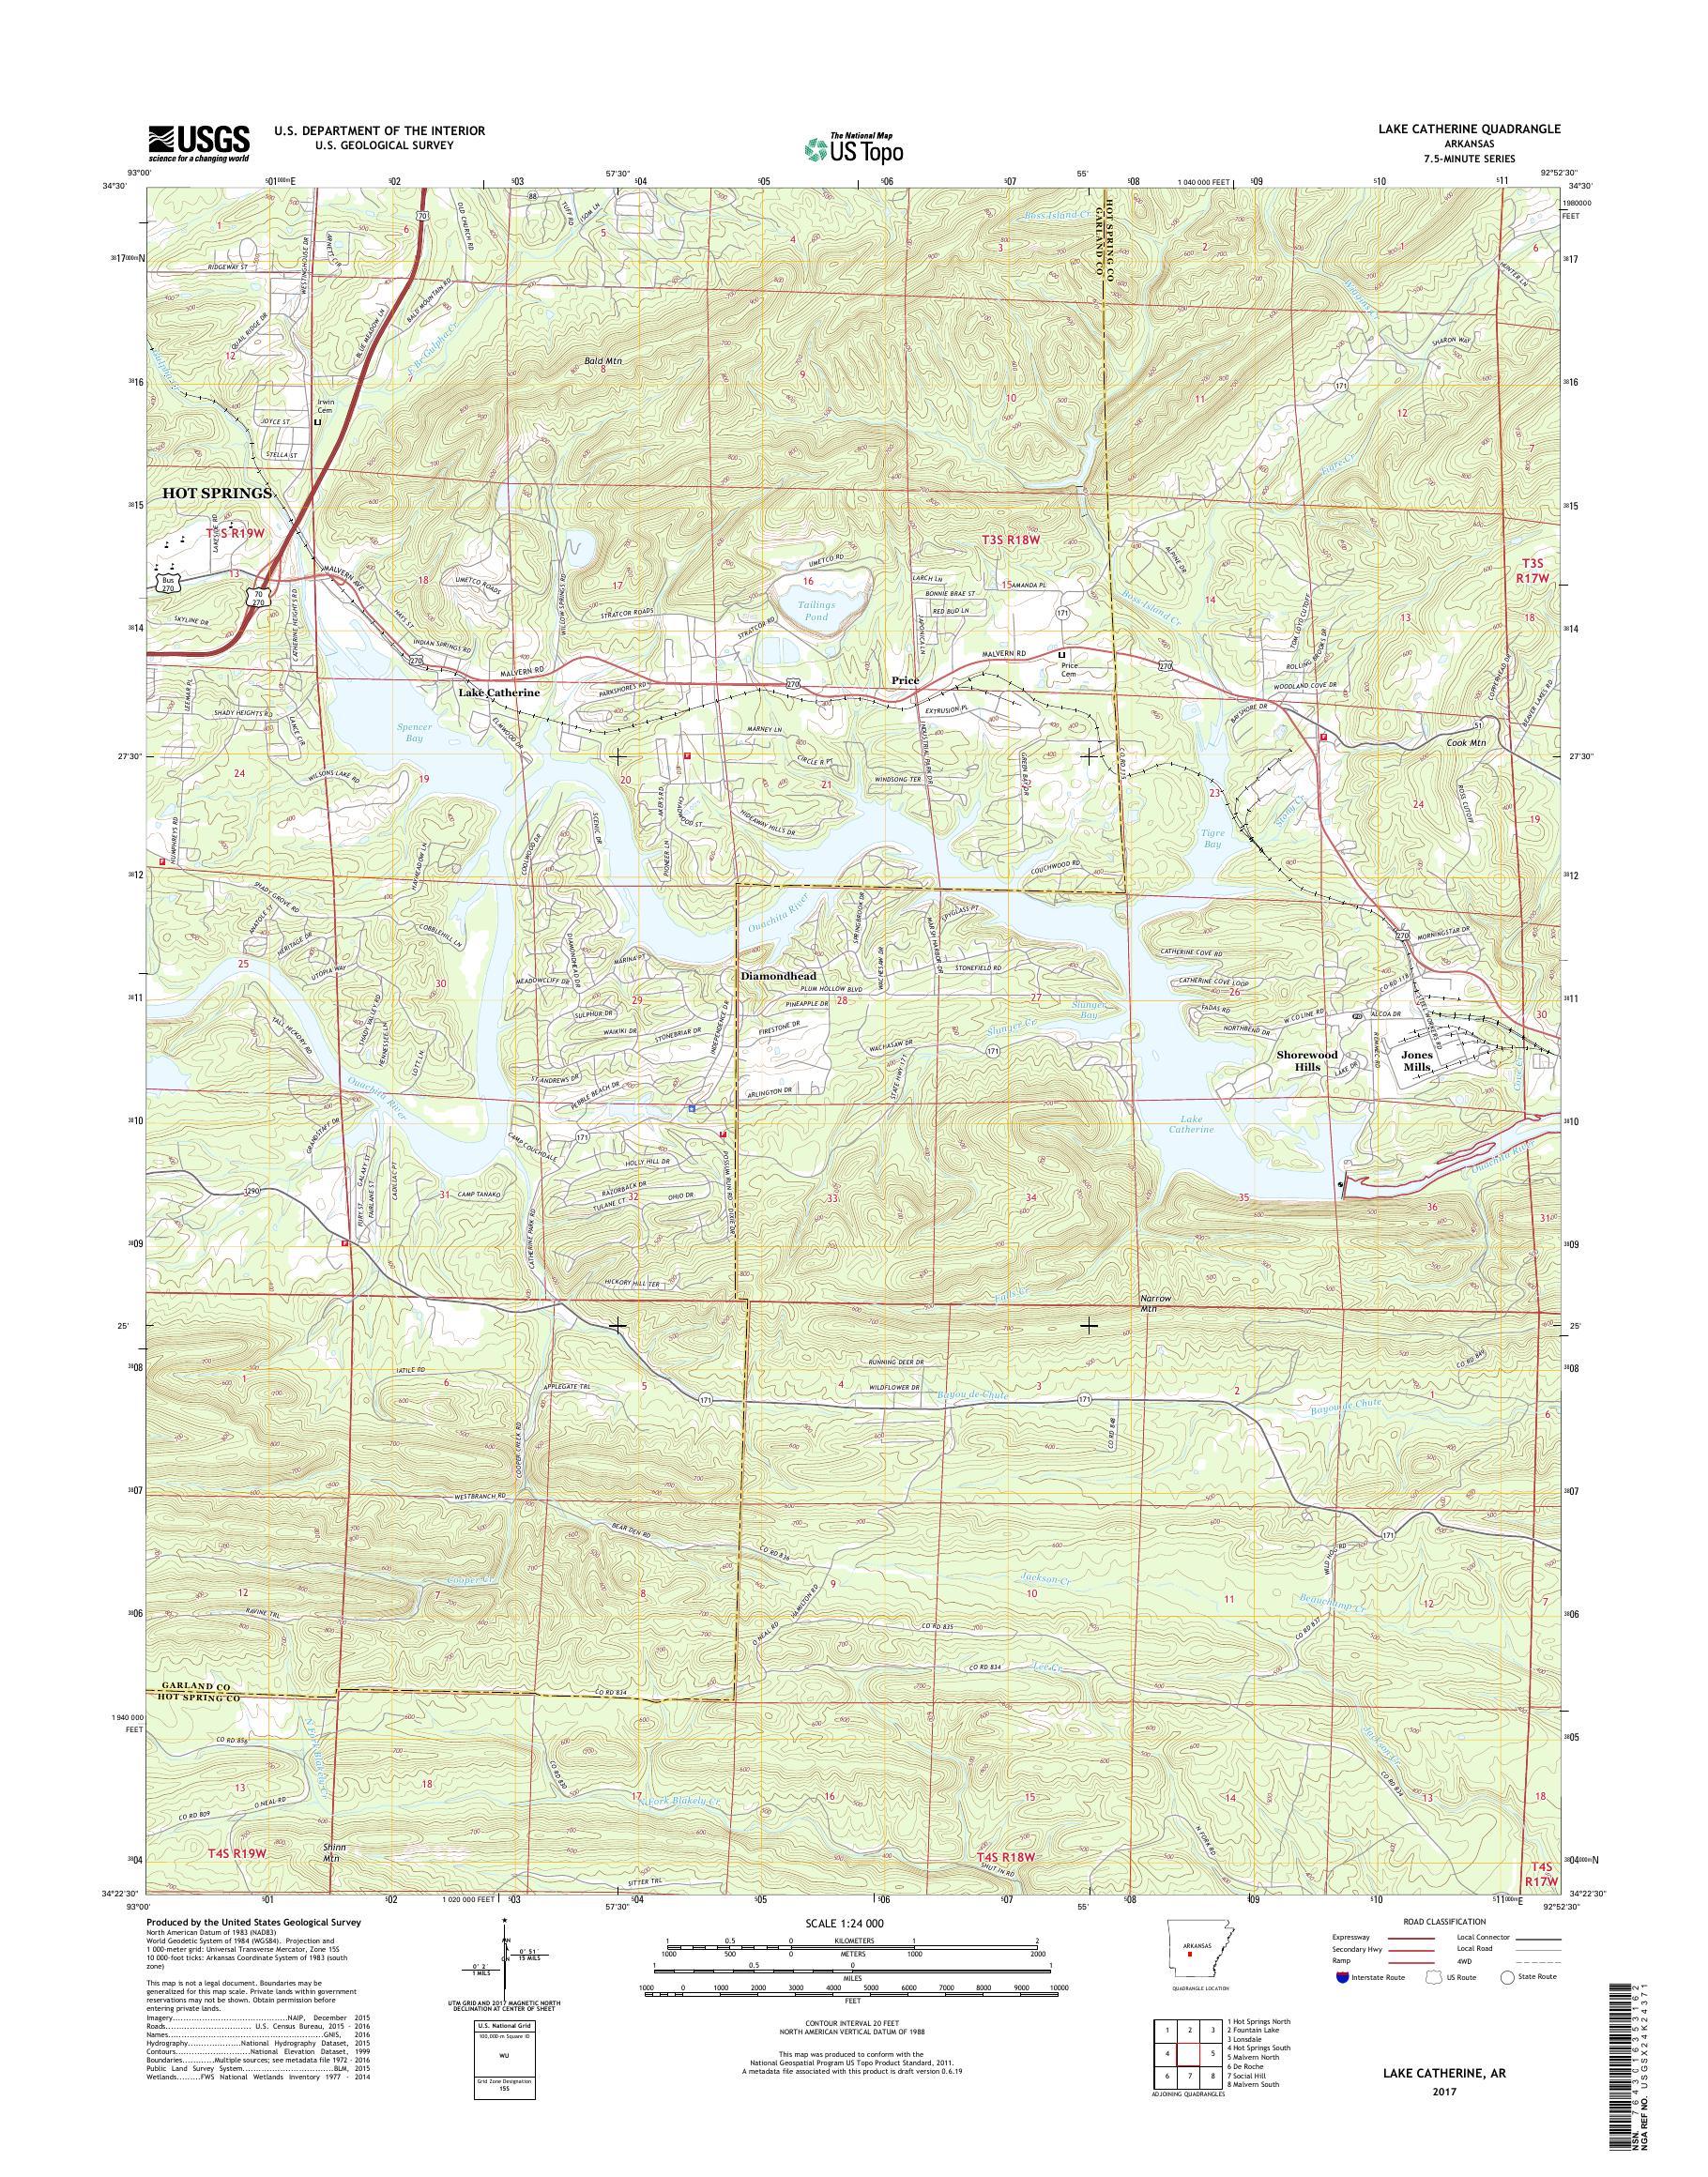 MyTopo Lake Catherine, Arkansas USGS Quad Topo Map